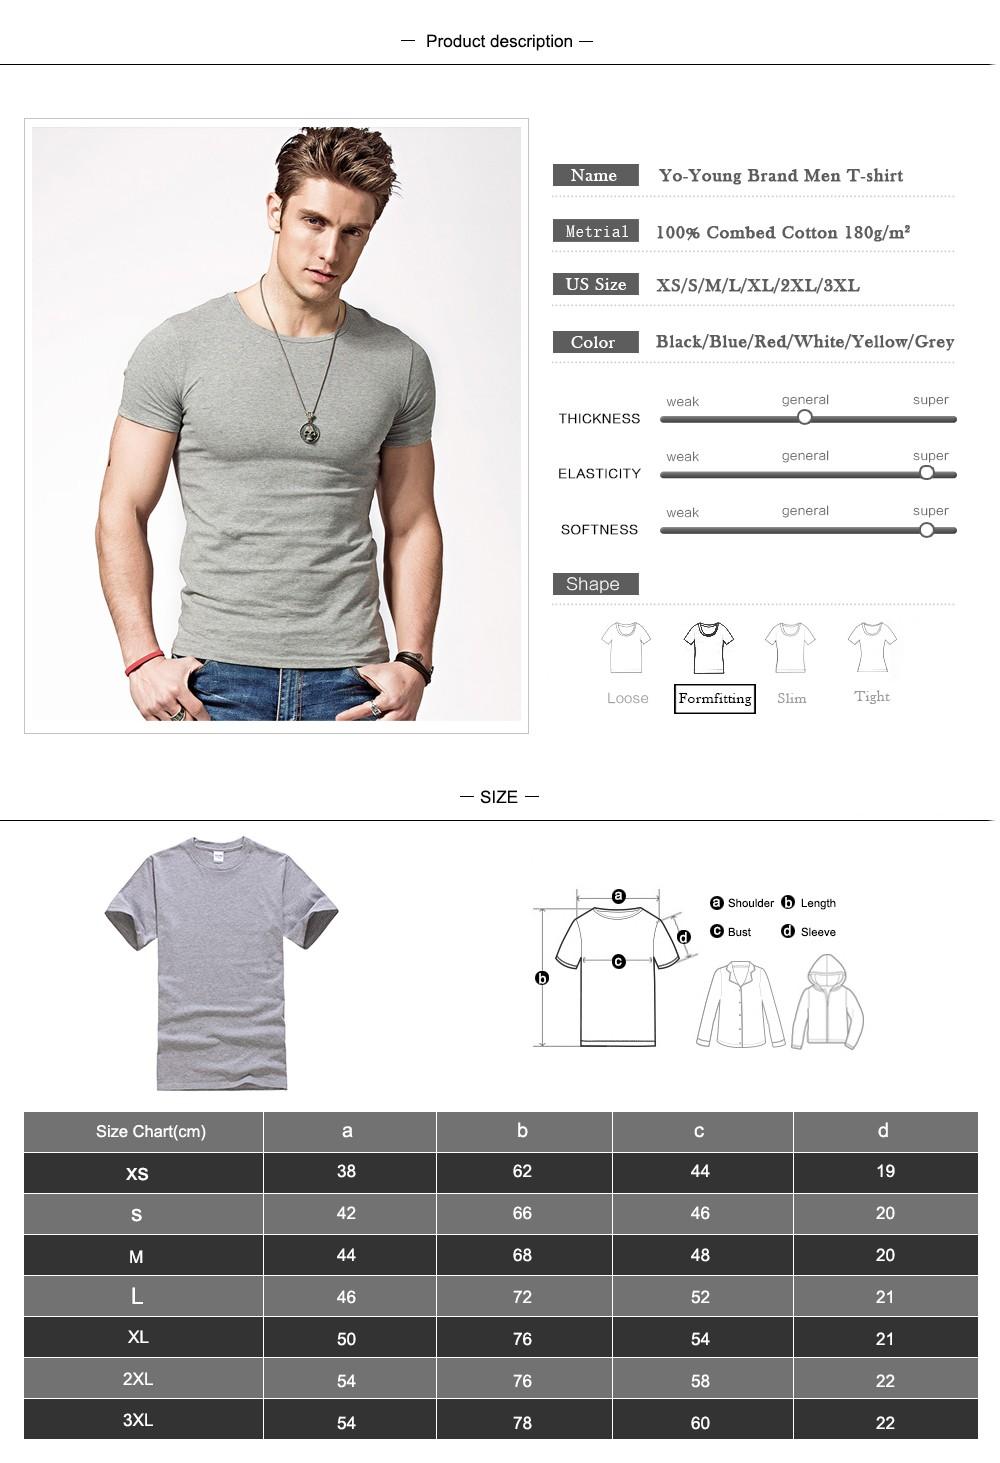 HTB1d.uyLVXXXXcFXFXXq6xXFXXXI - Game Of Thrones Hodor Jon Snow Men T Shirts Funny Design T-shirts For Men Digital Printed 100% 180g Combed Cotton Customized